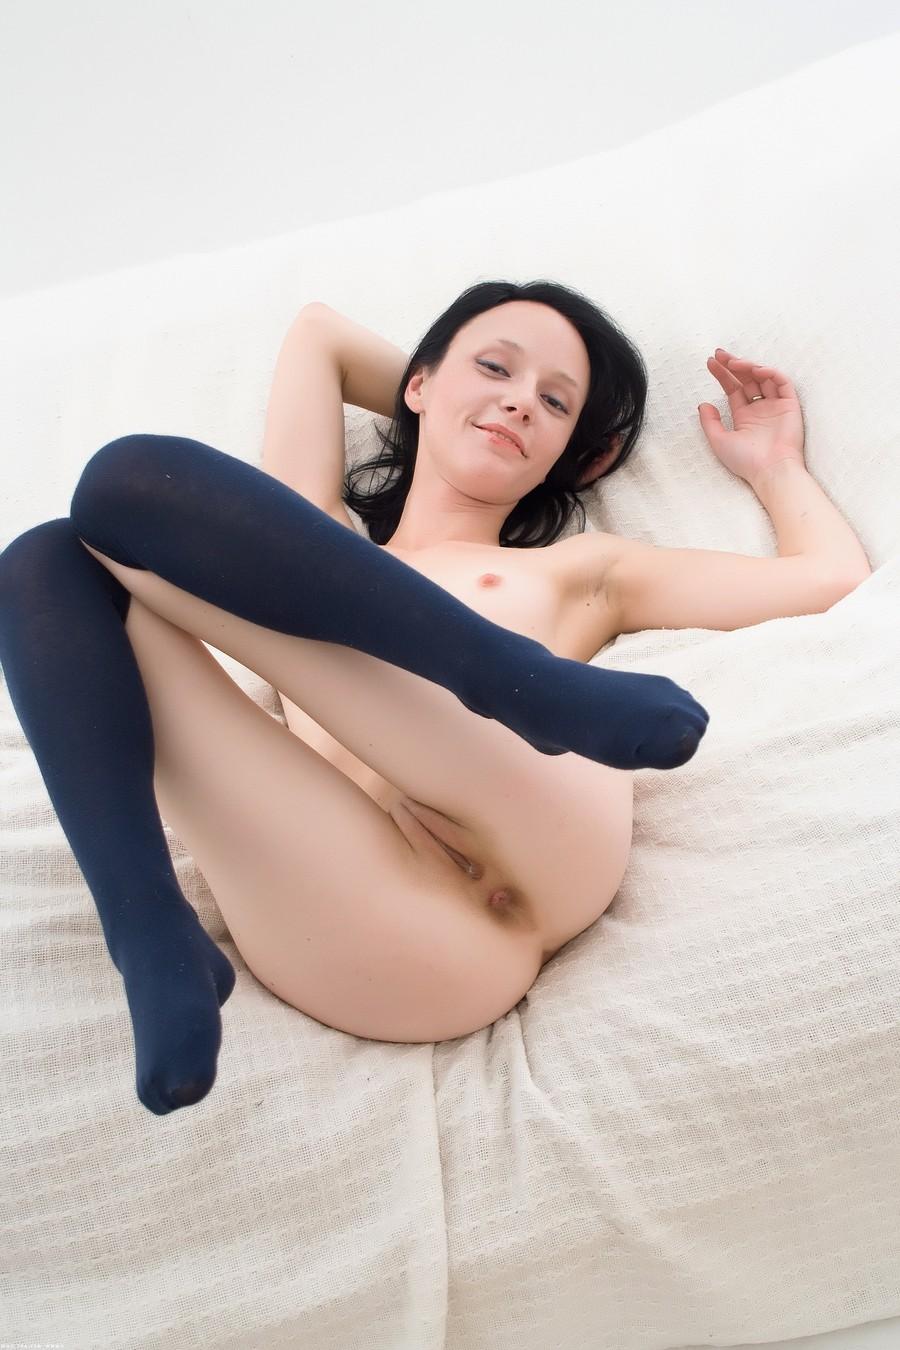 free trany porn videos